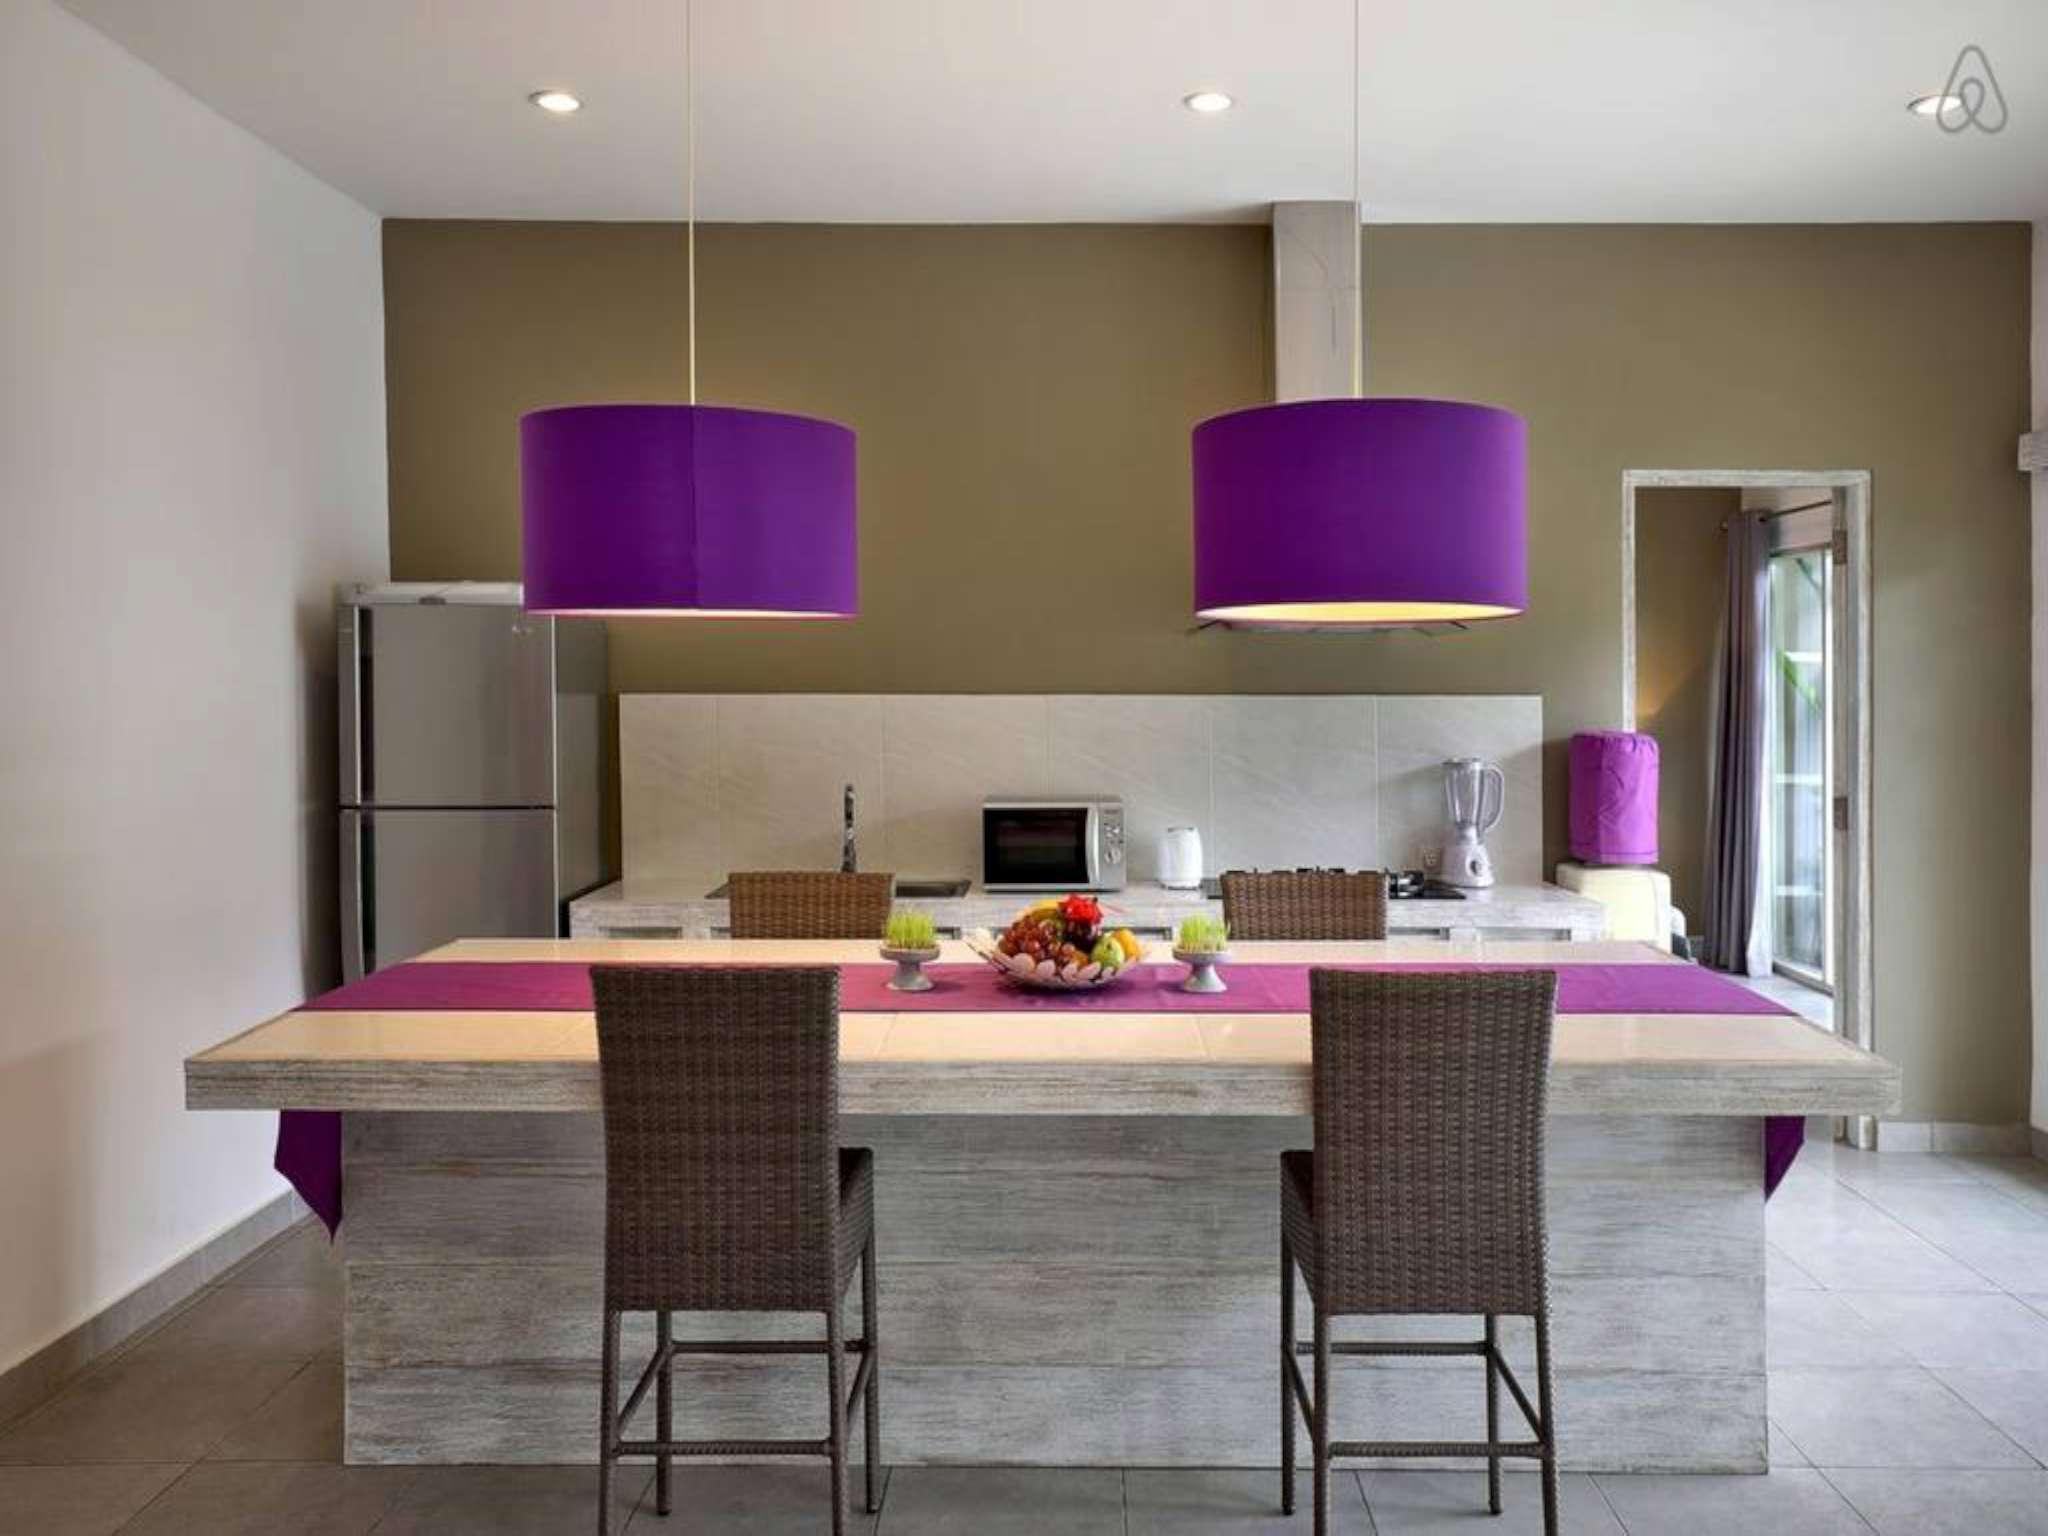 2 Bedrom Villa In Legian